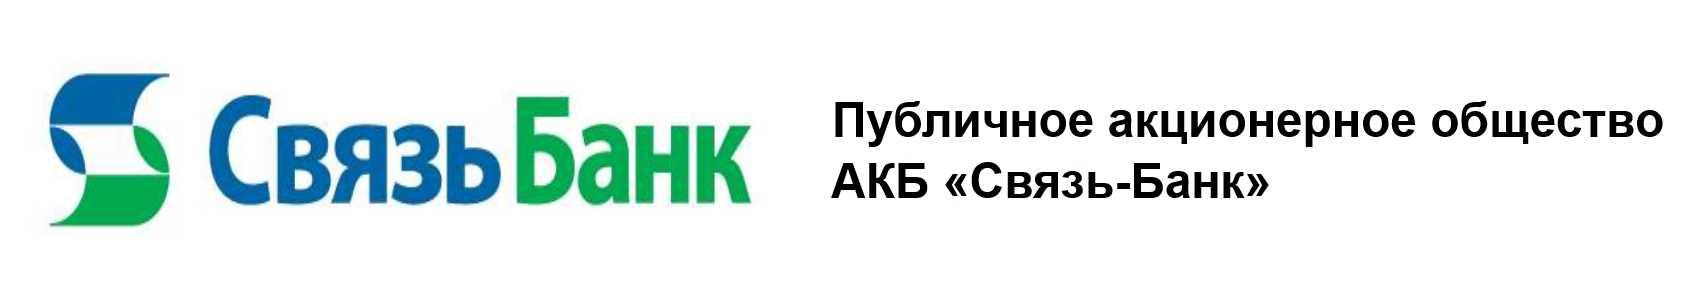 АКБ «Связь-Банк»